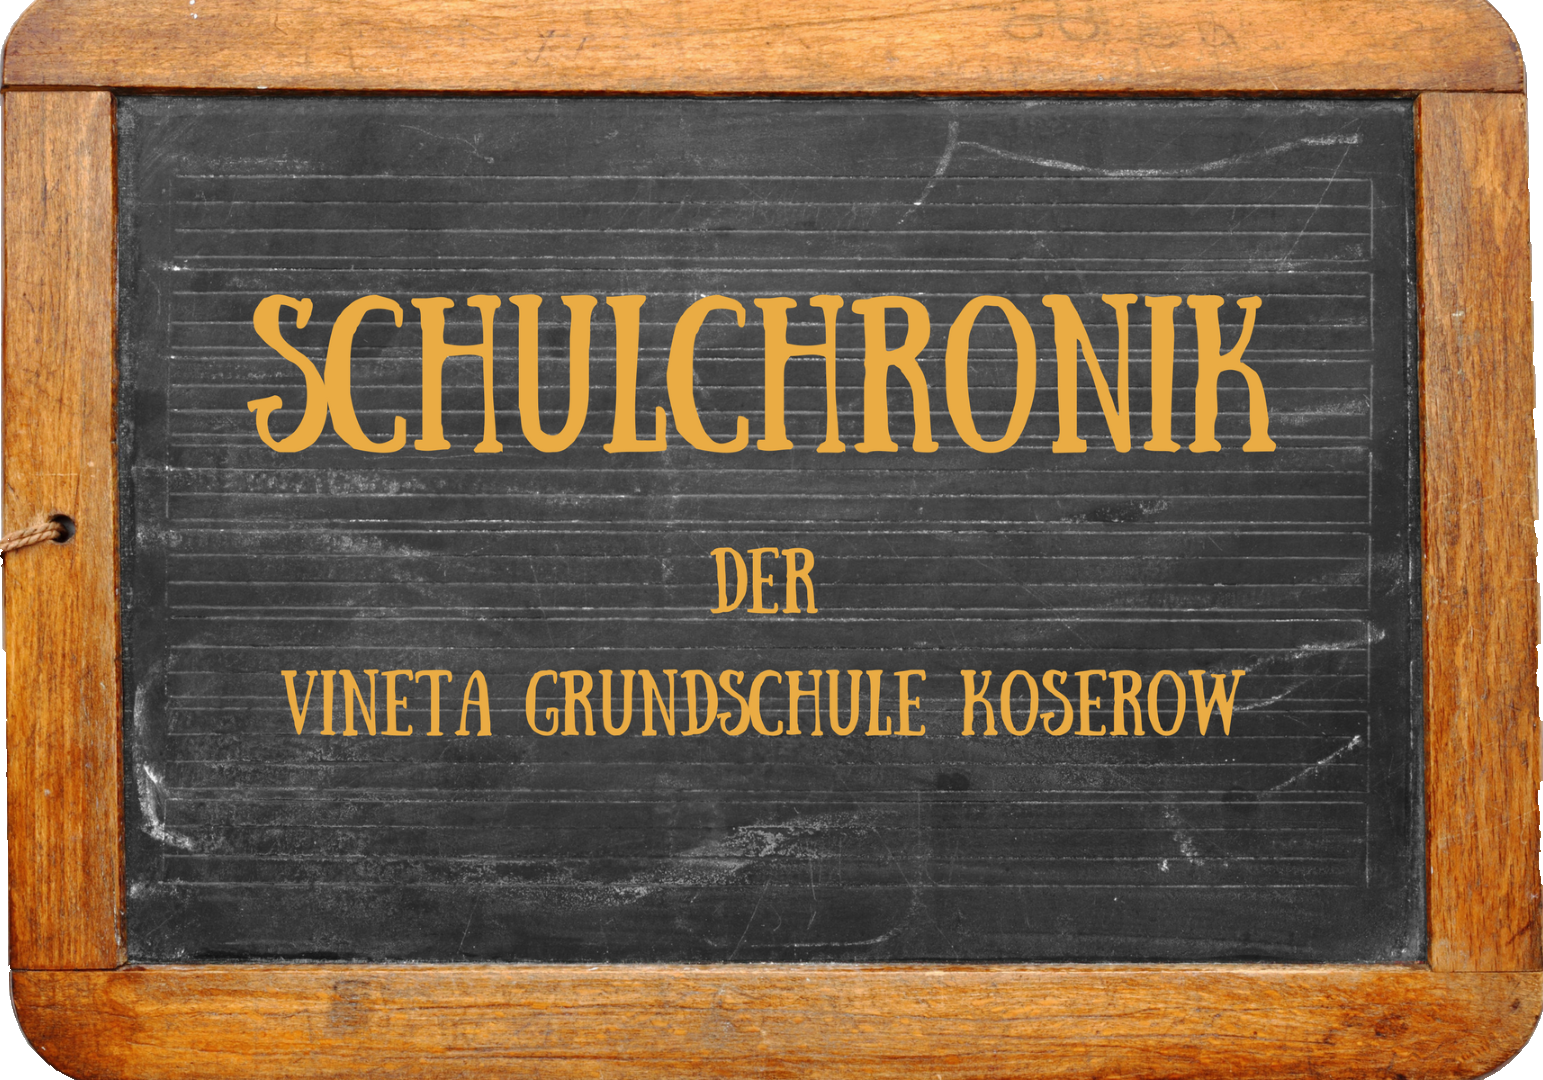 Schulchronik Vineta Grundschule Koserow